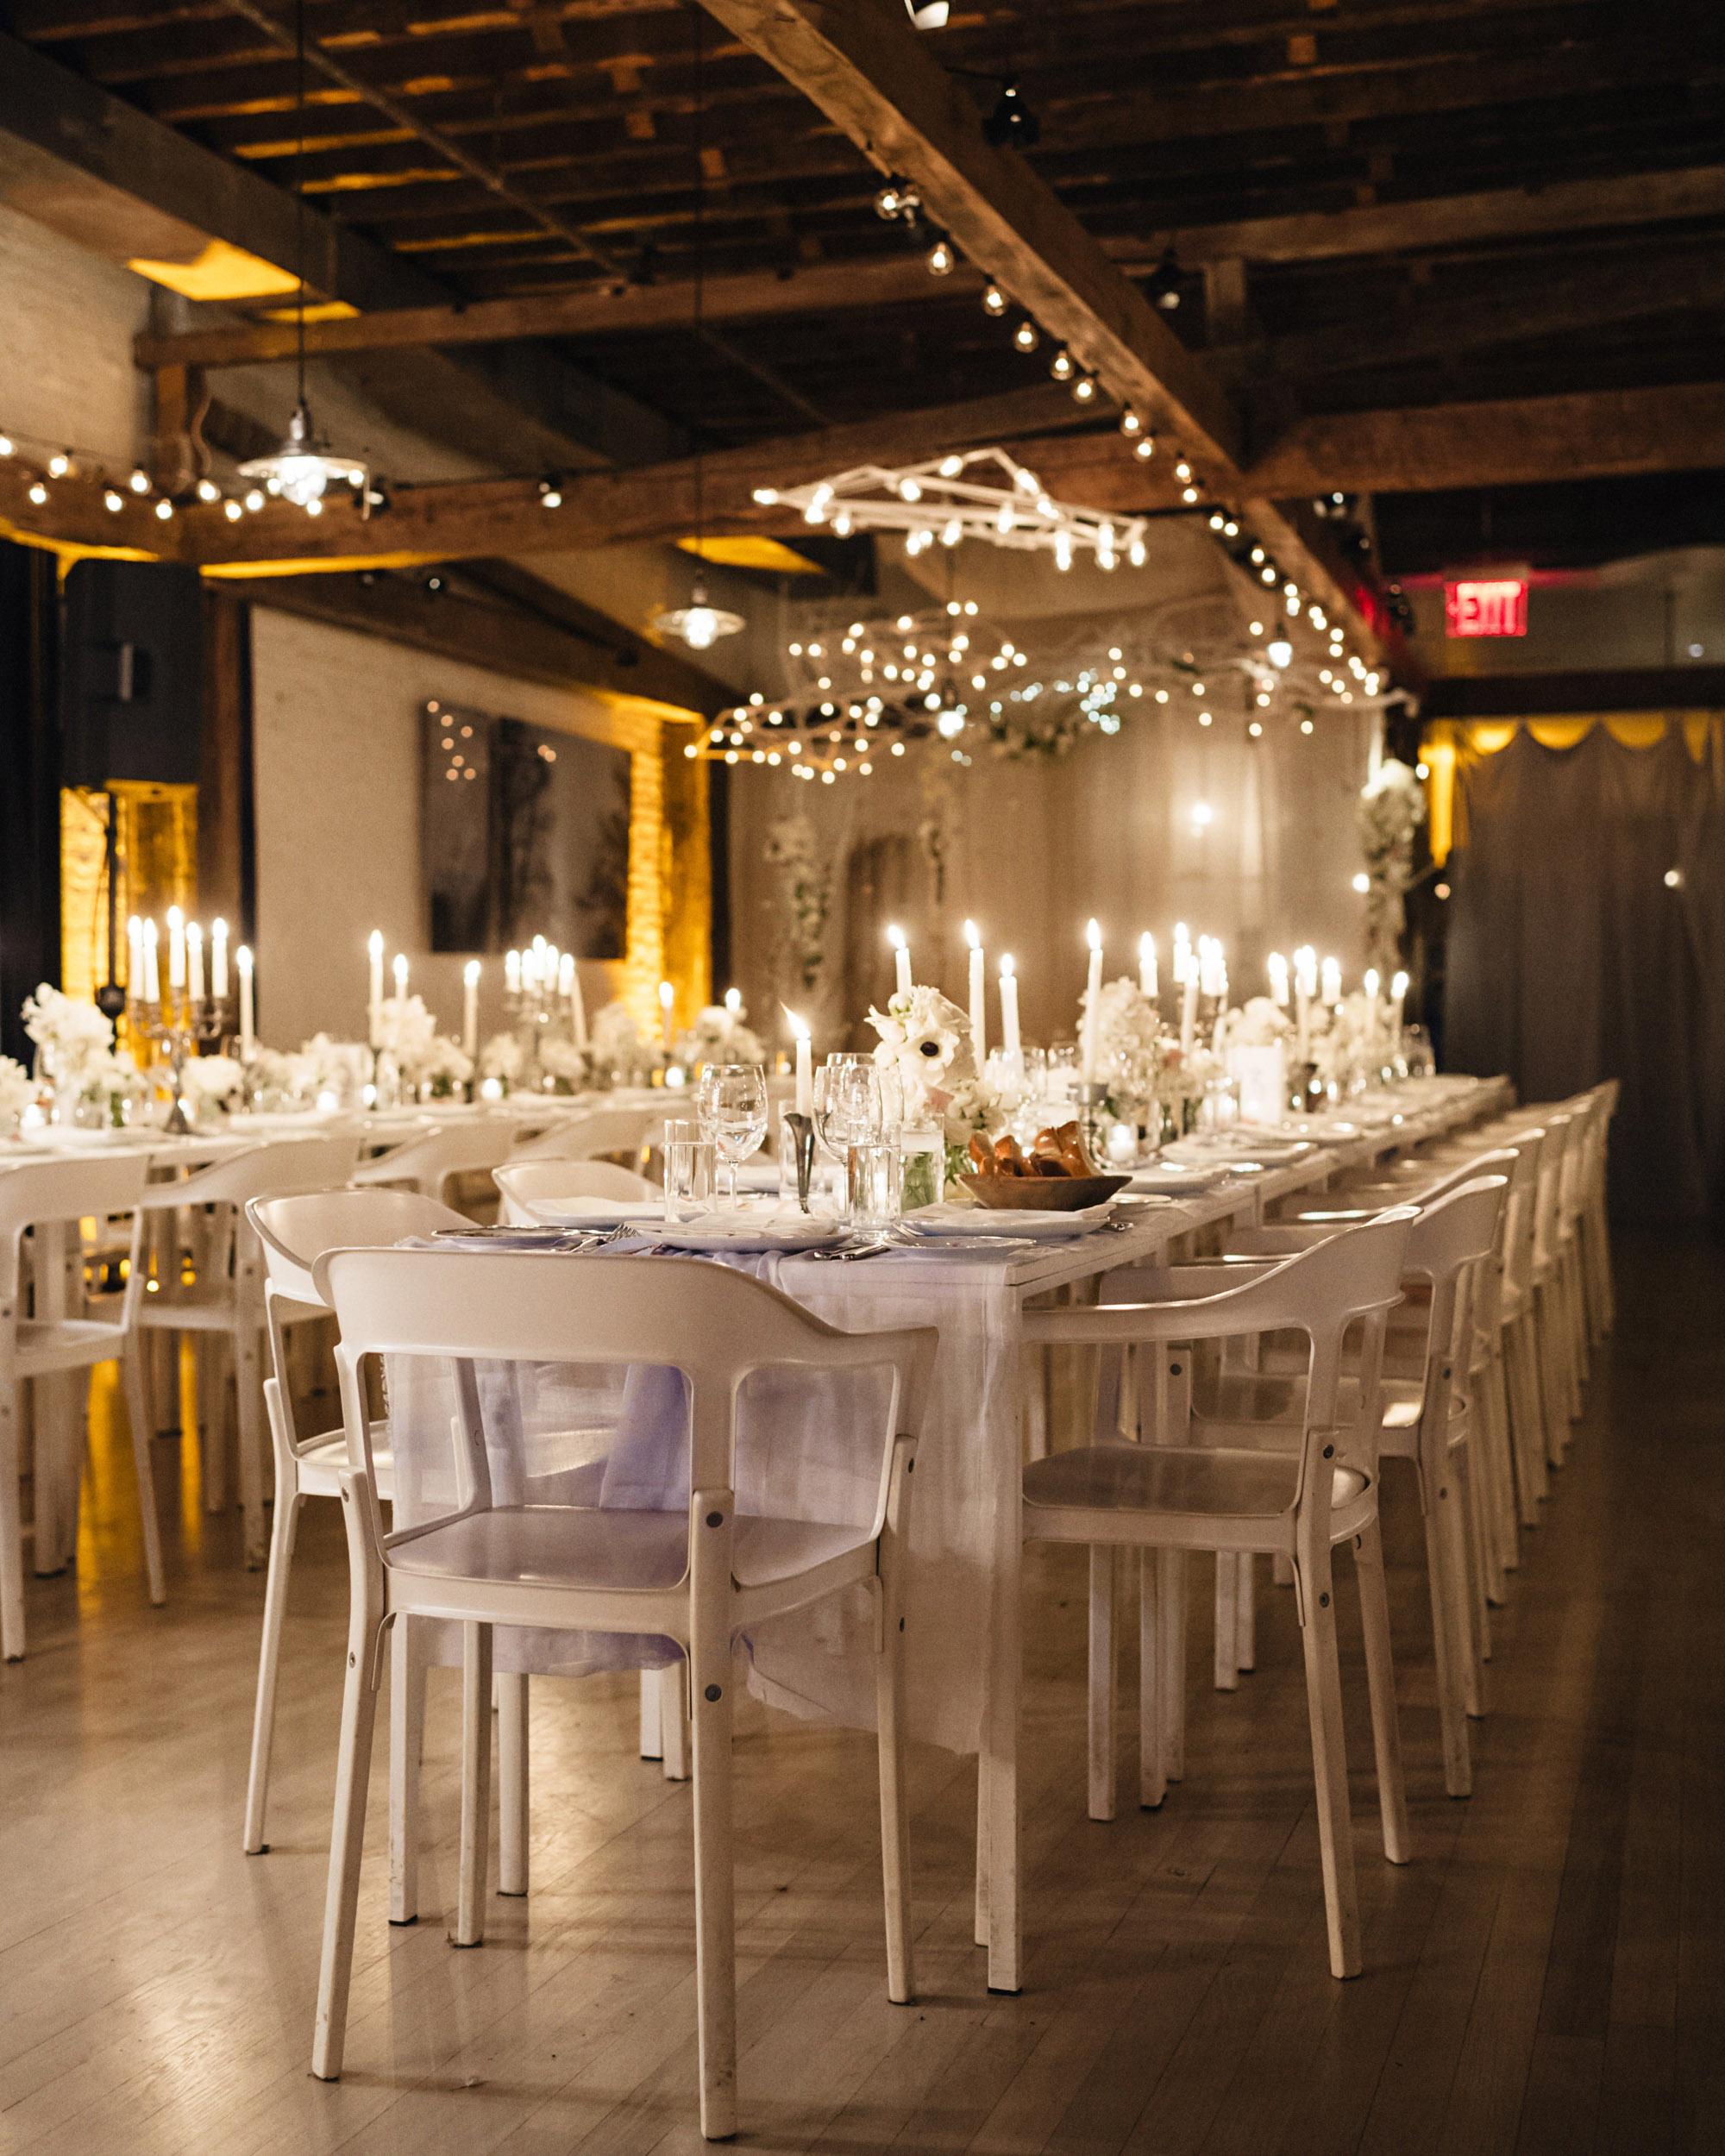 ABC Kitchen New York Wedding Photographer 13 - ABC Kitchen